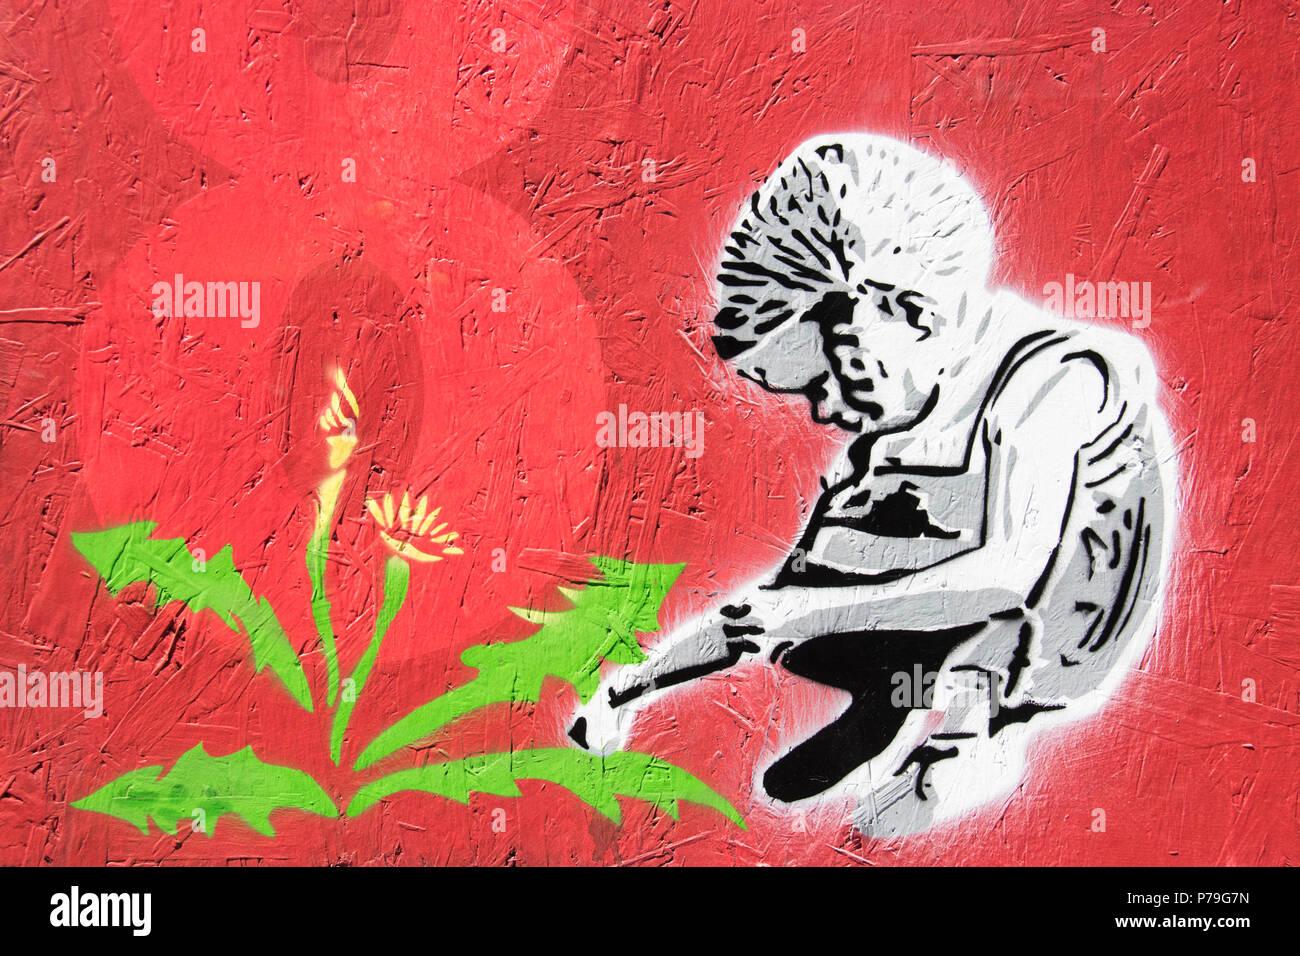 Weeds - Stock Image